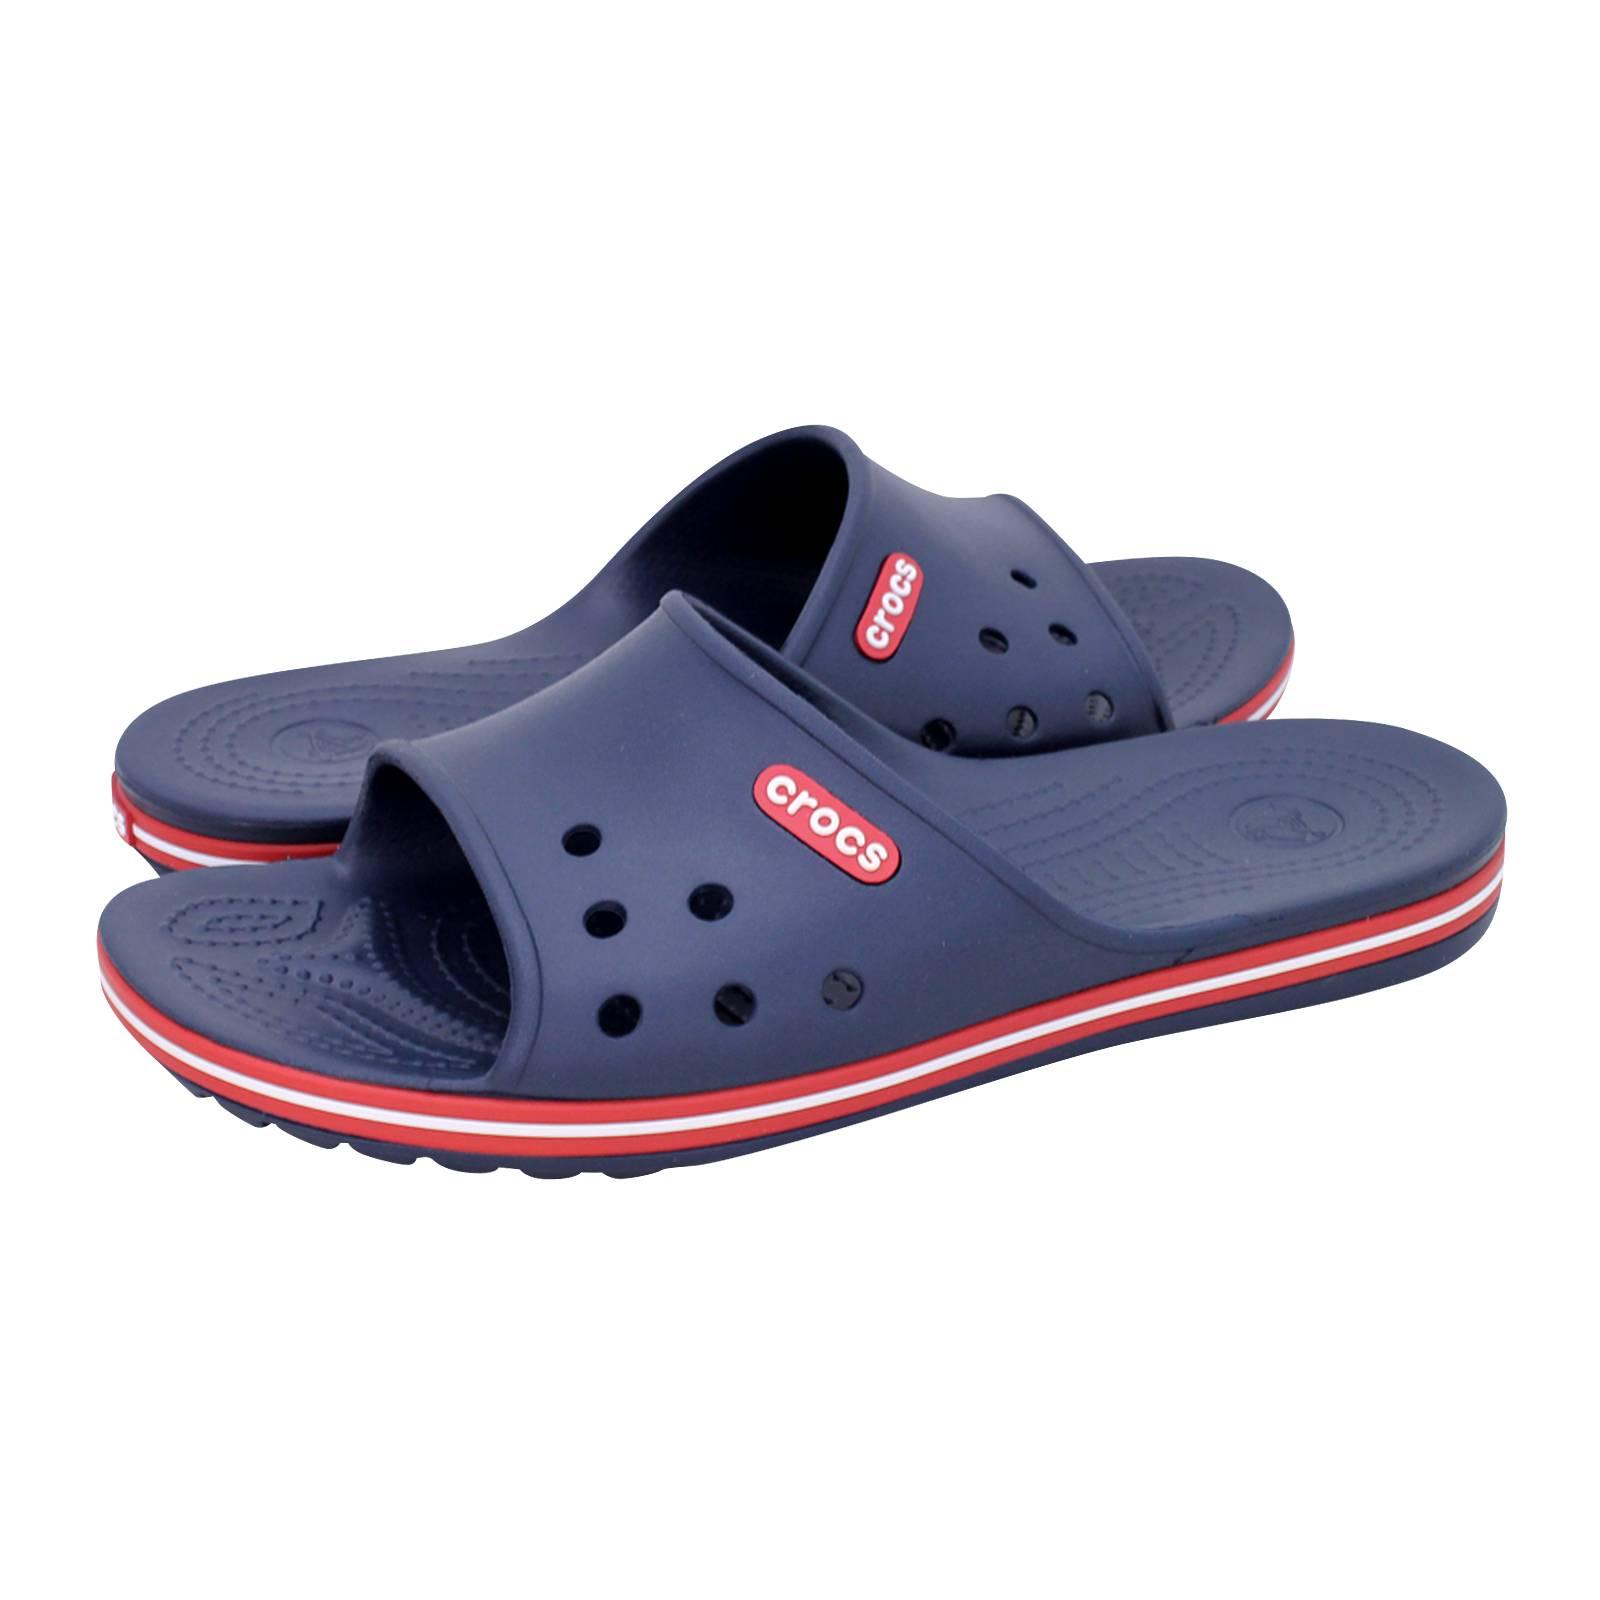 b6d8639f4 Crocband II Slide - Crocs Men s sandals made of croslite - Gianna ...